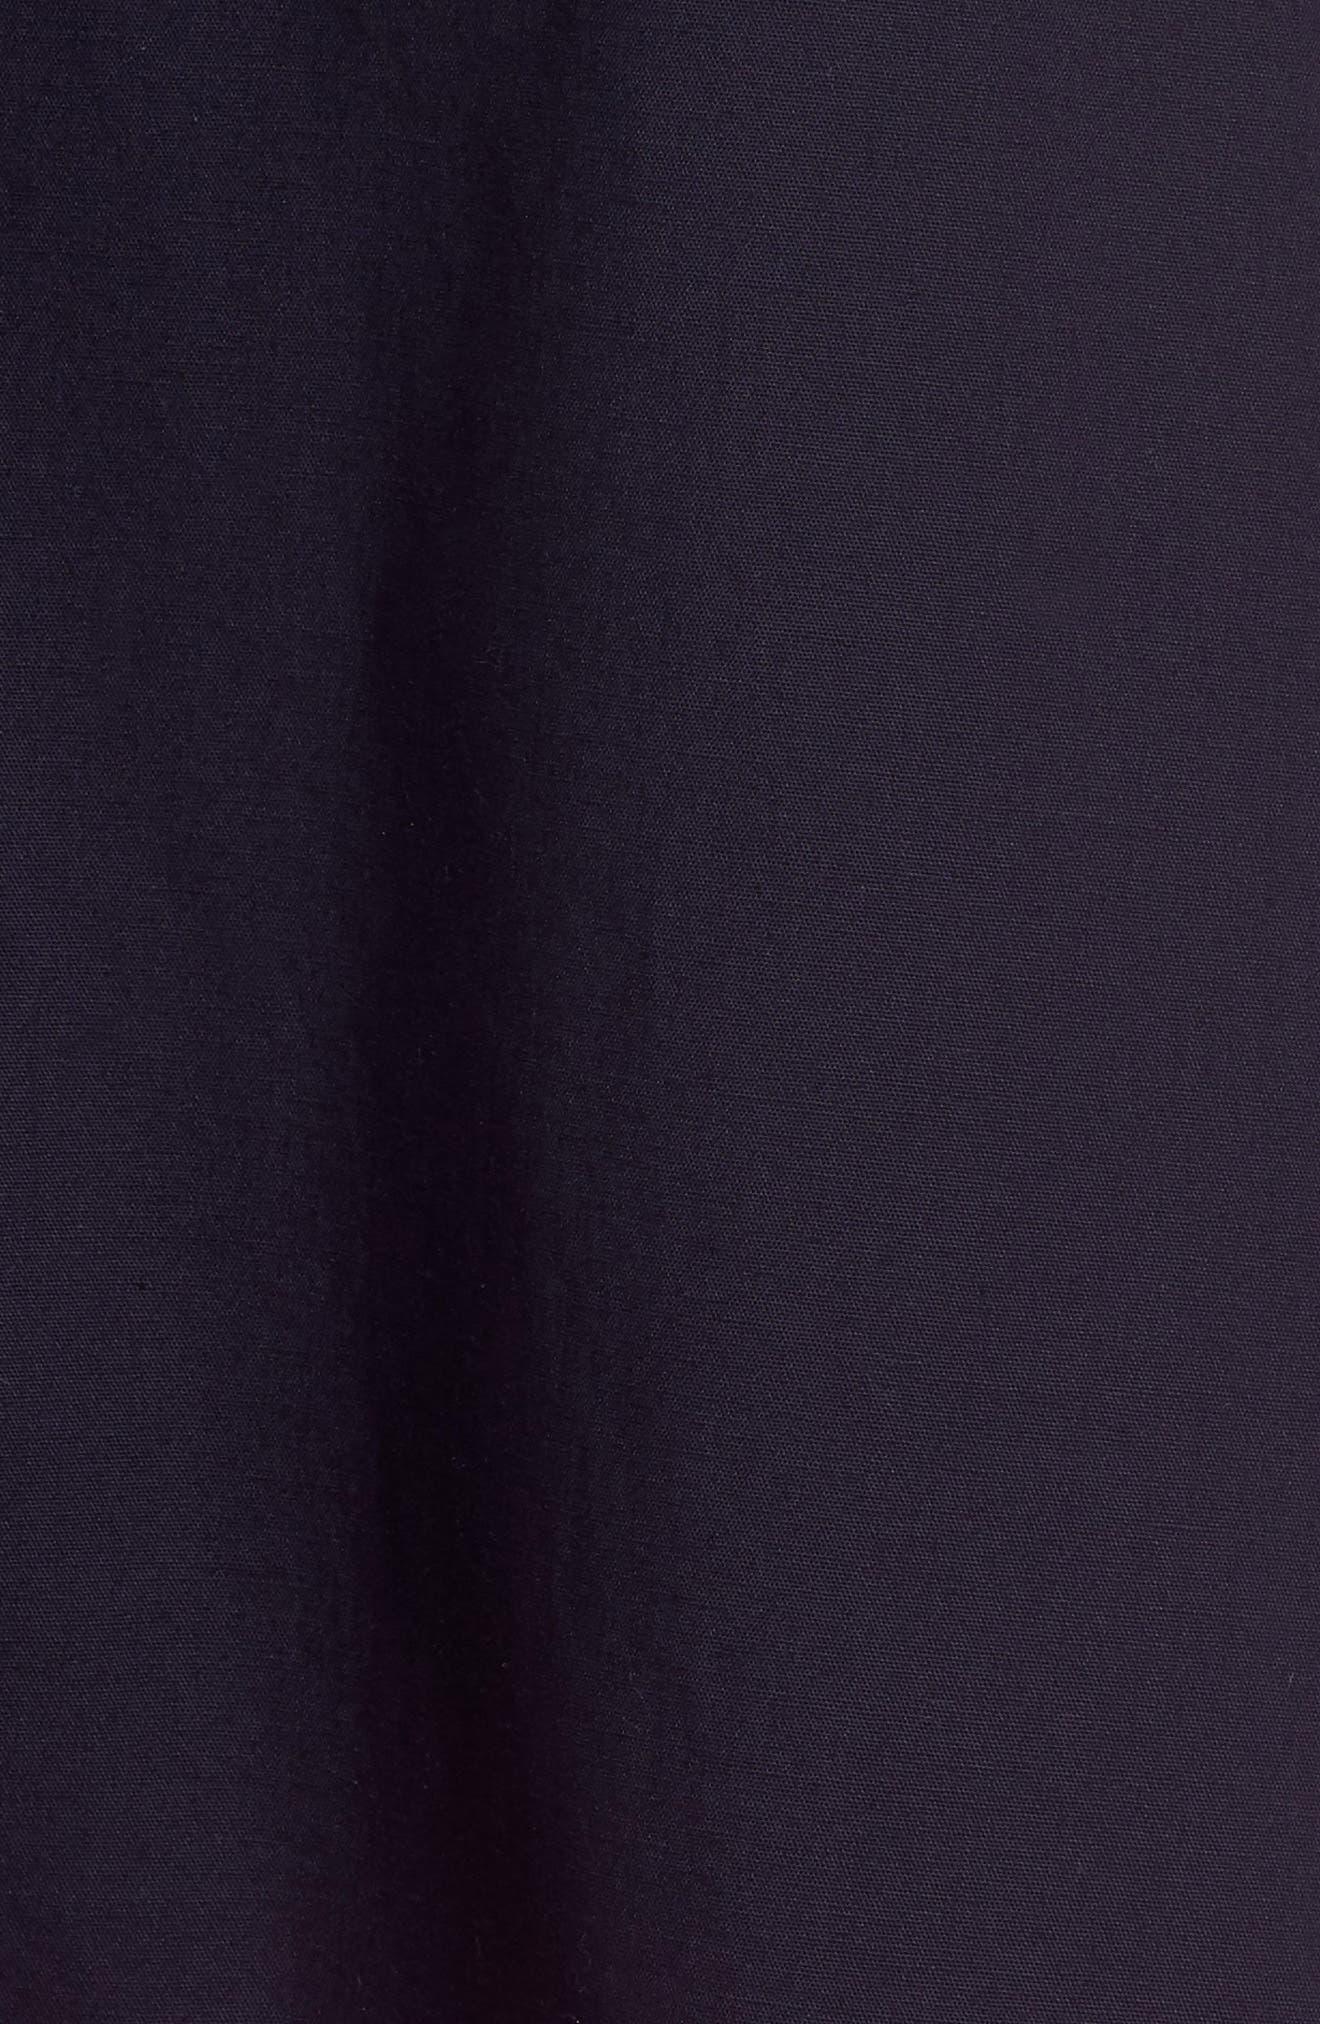 Colorblock Cotton Midi Dress,                             Alternate thumbnail 5, color,                             Navy Red Color Block